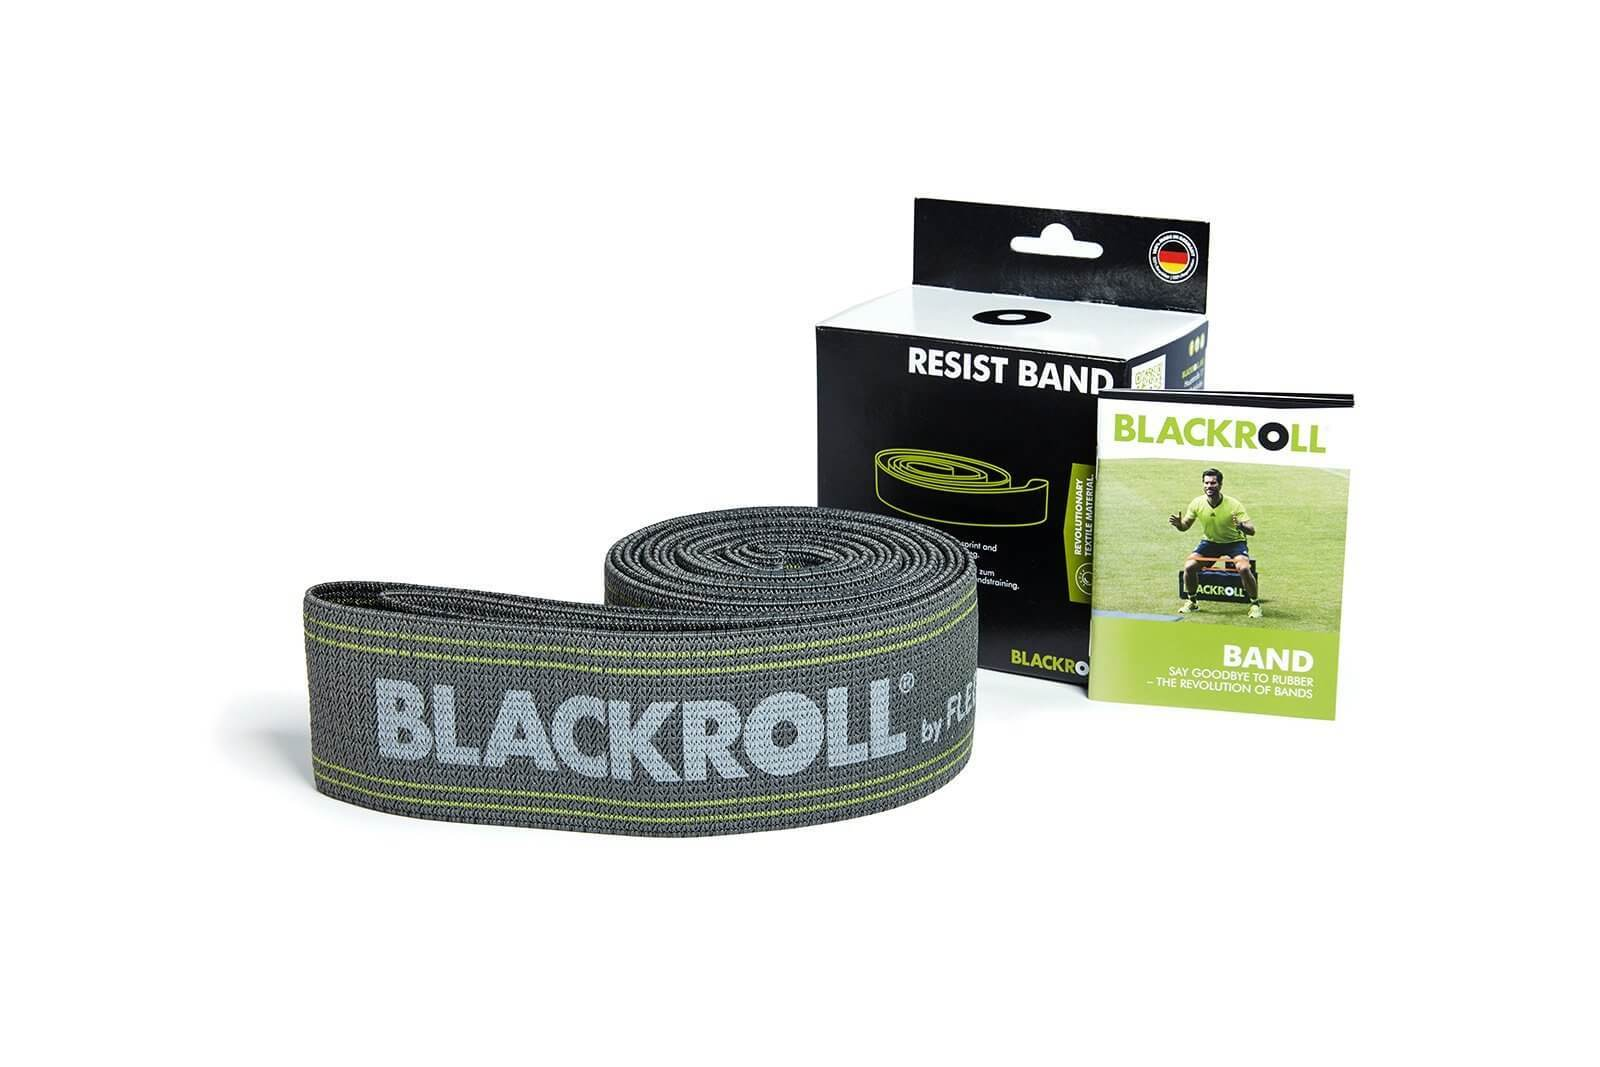 Оборудование BLACKROLL® для тренинга Эспандер-лента текстильная BLACKROLL® RESIST BAND 190 см (тяжелое сопротивление) BLACKROLL_white_small_0088_Sebastian_Schoffel_4b323ae4-8878-41b0-9704-1d808522345d.jpg